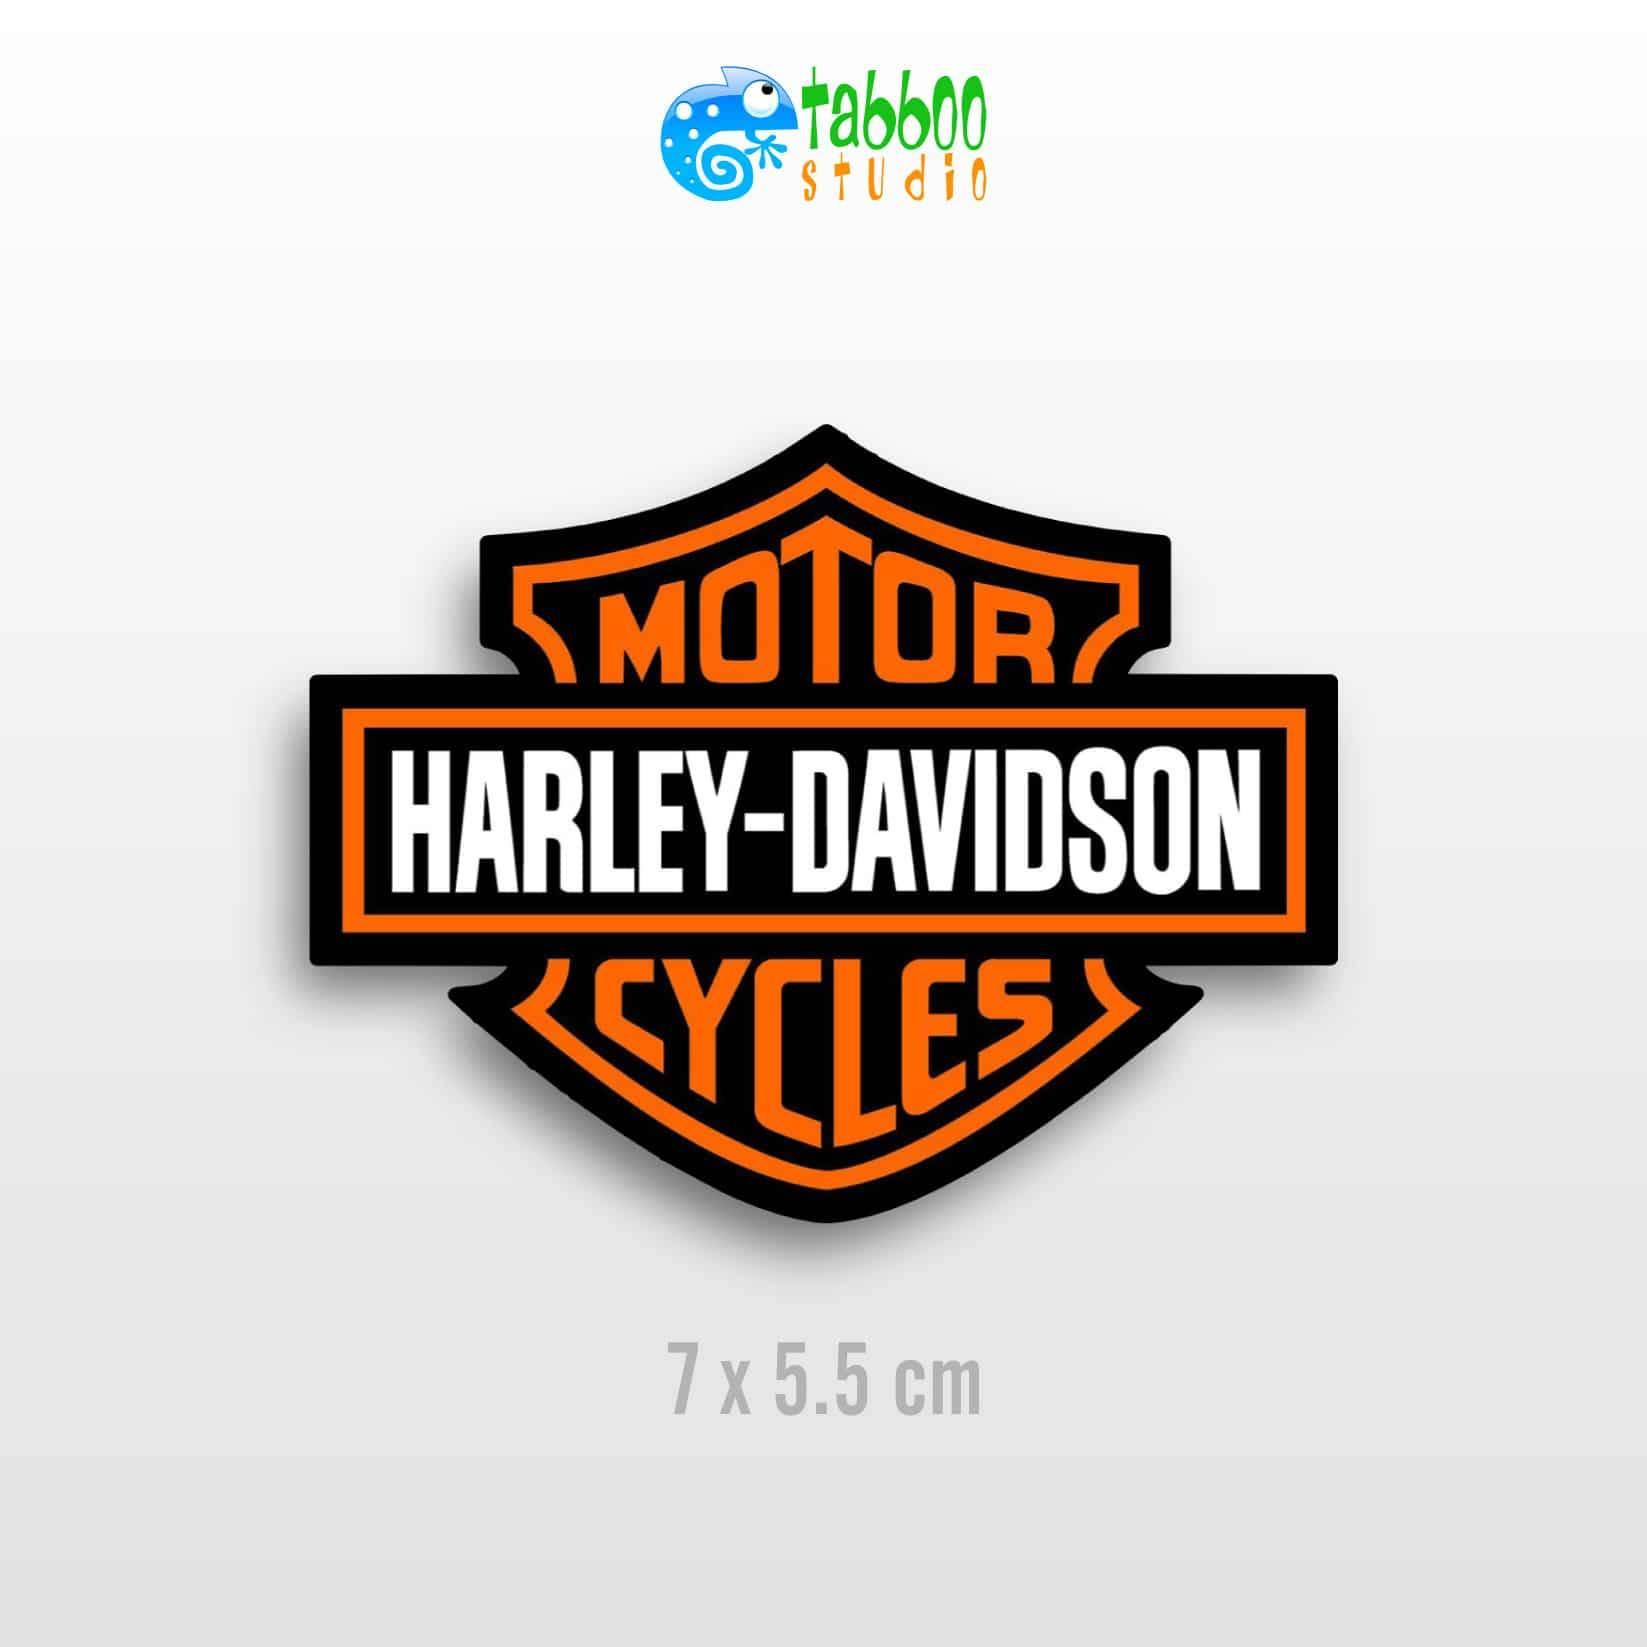 Harley davidson stickers logo replica moto custom casco helmet